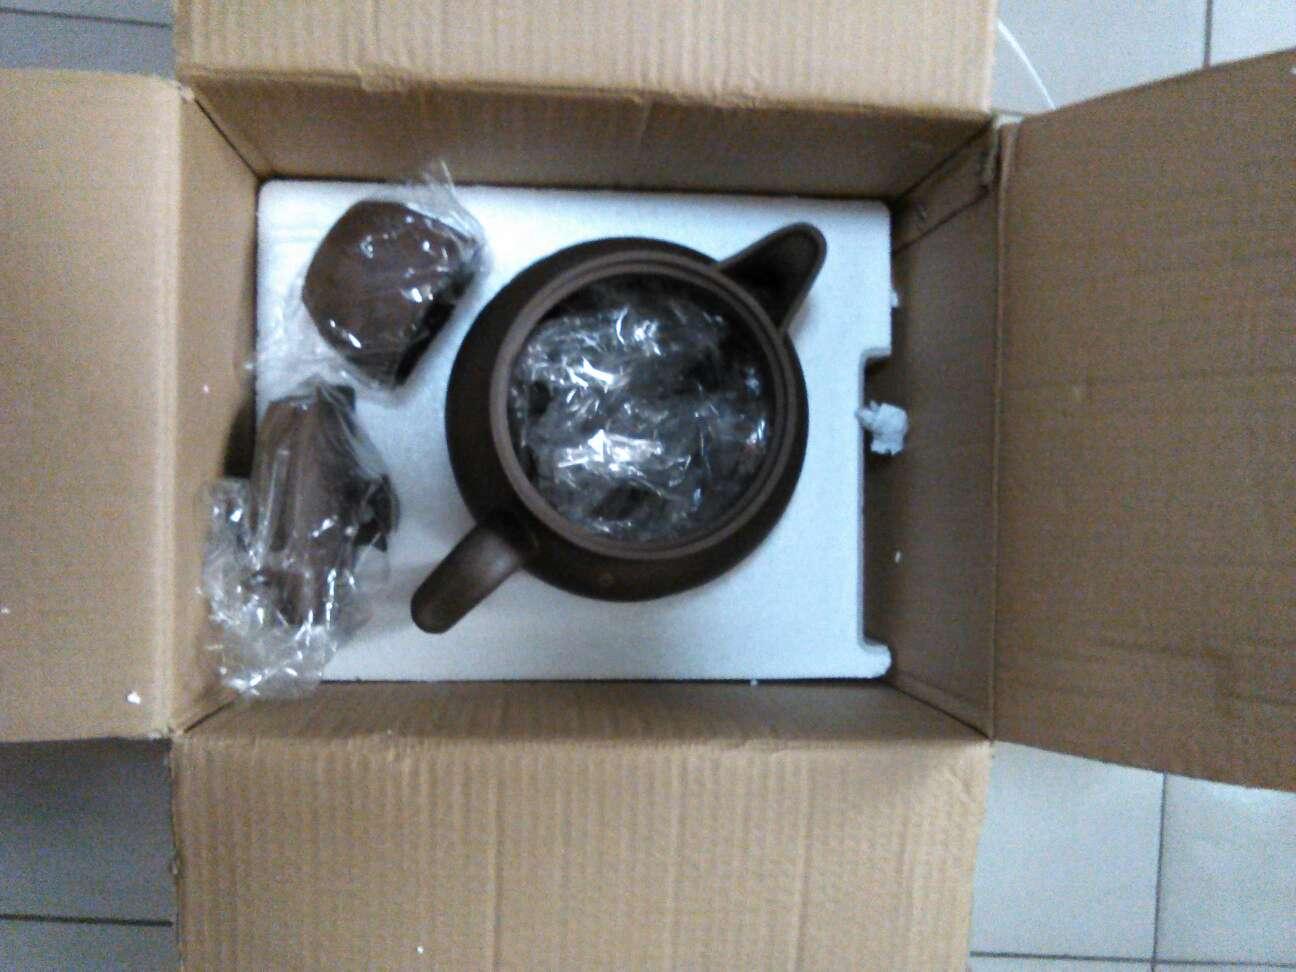 air jordan 3 wolf grey price 00980428 sale